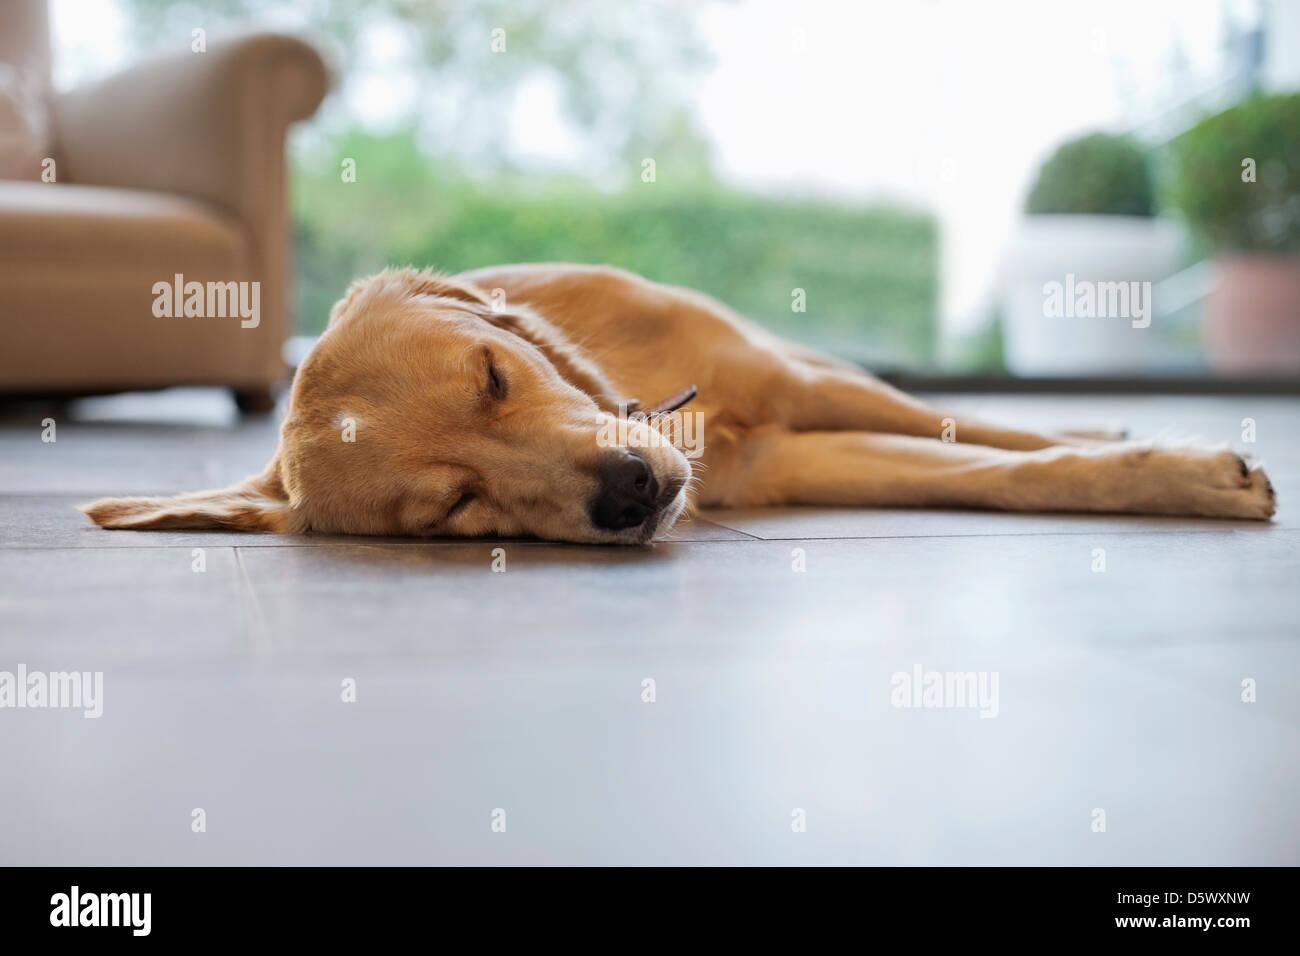 Dog sleeping on living room floor - Stock Image